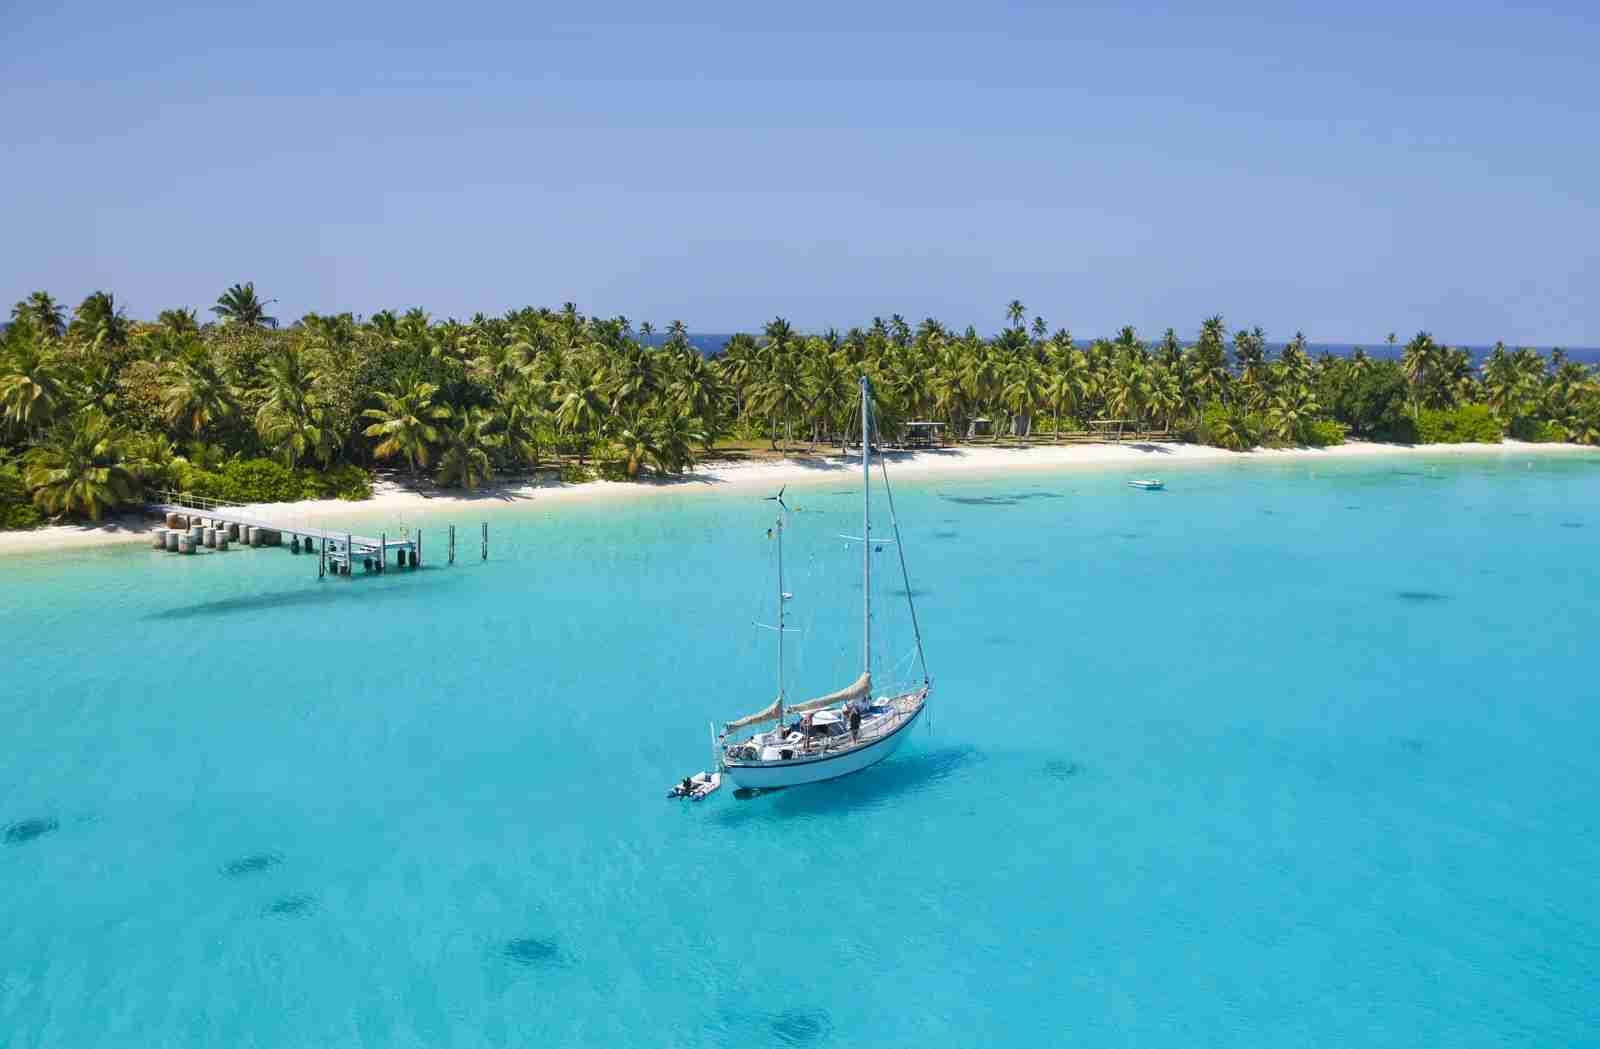 A Cocos Keeling Island atoll. (Photo via Shutterstock)